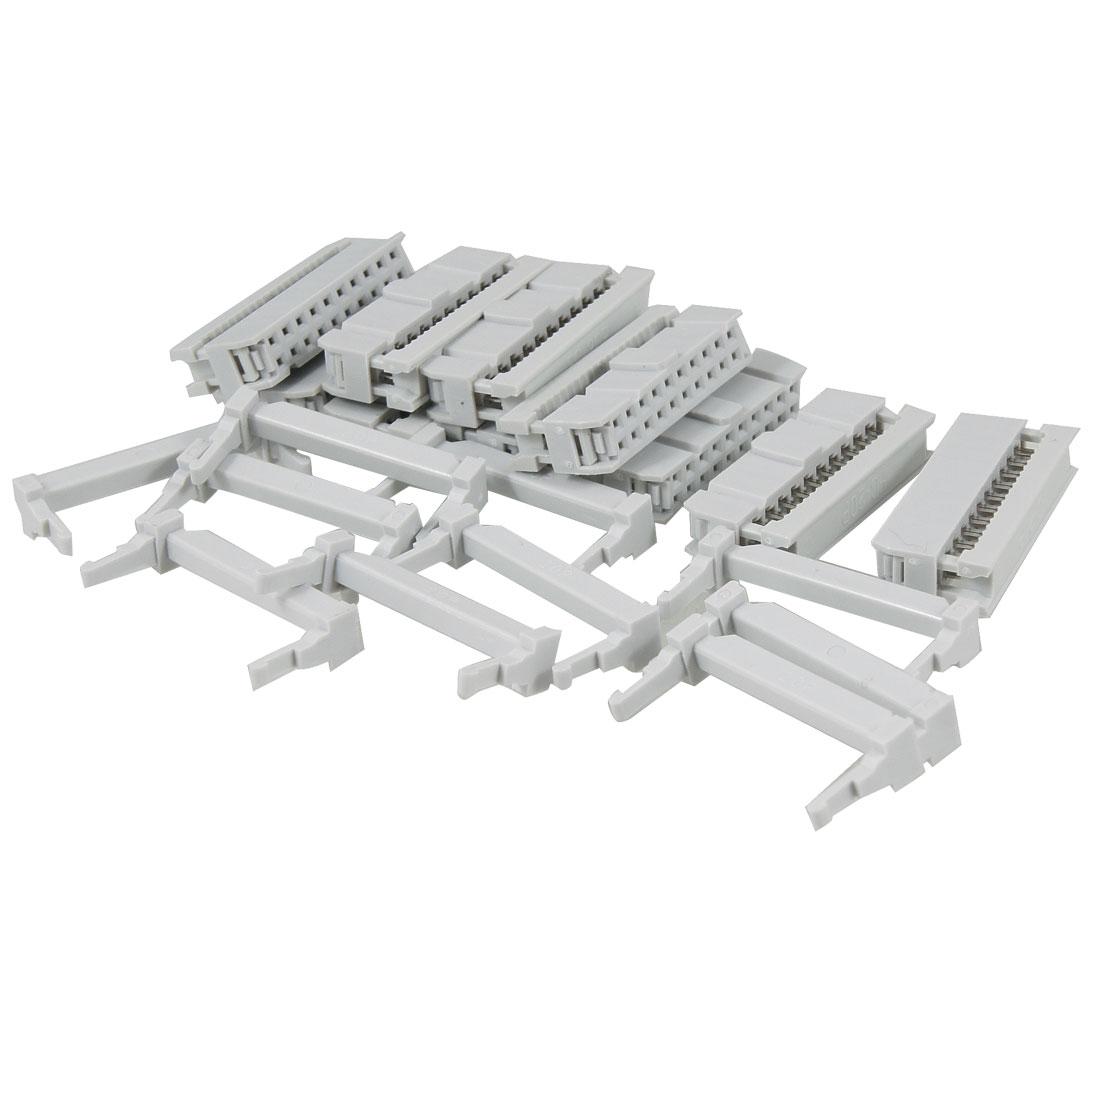 10 Pcs Flat Ribbon Cable 2 Row 20 Pin IDC Socket Connector Light Gray